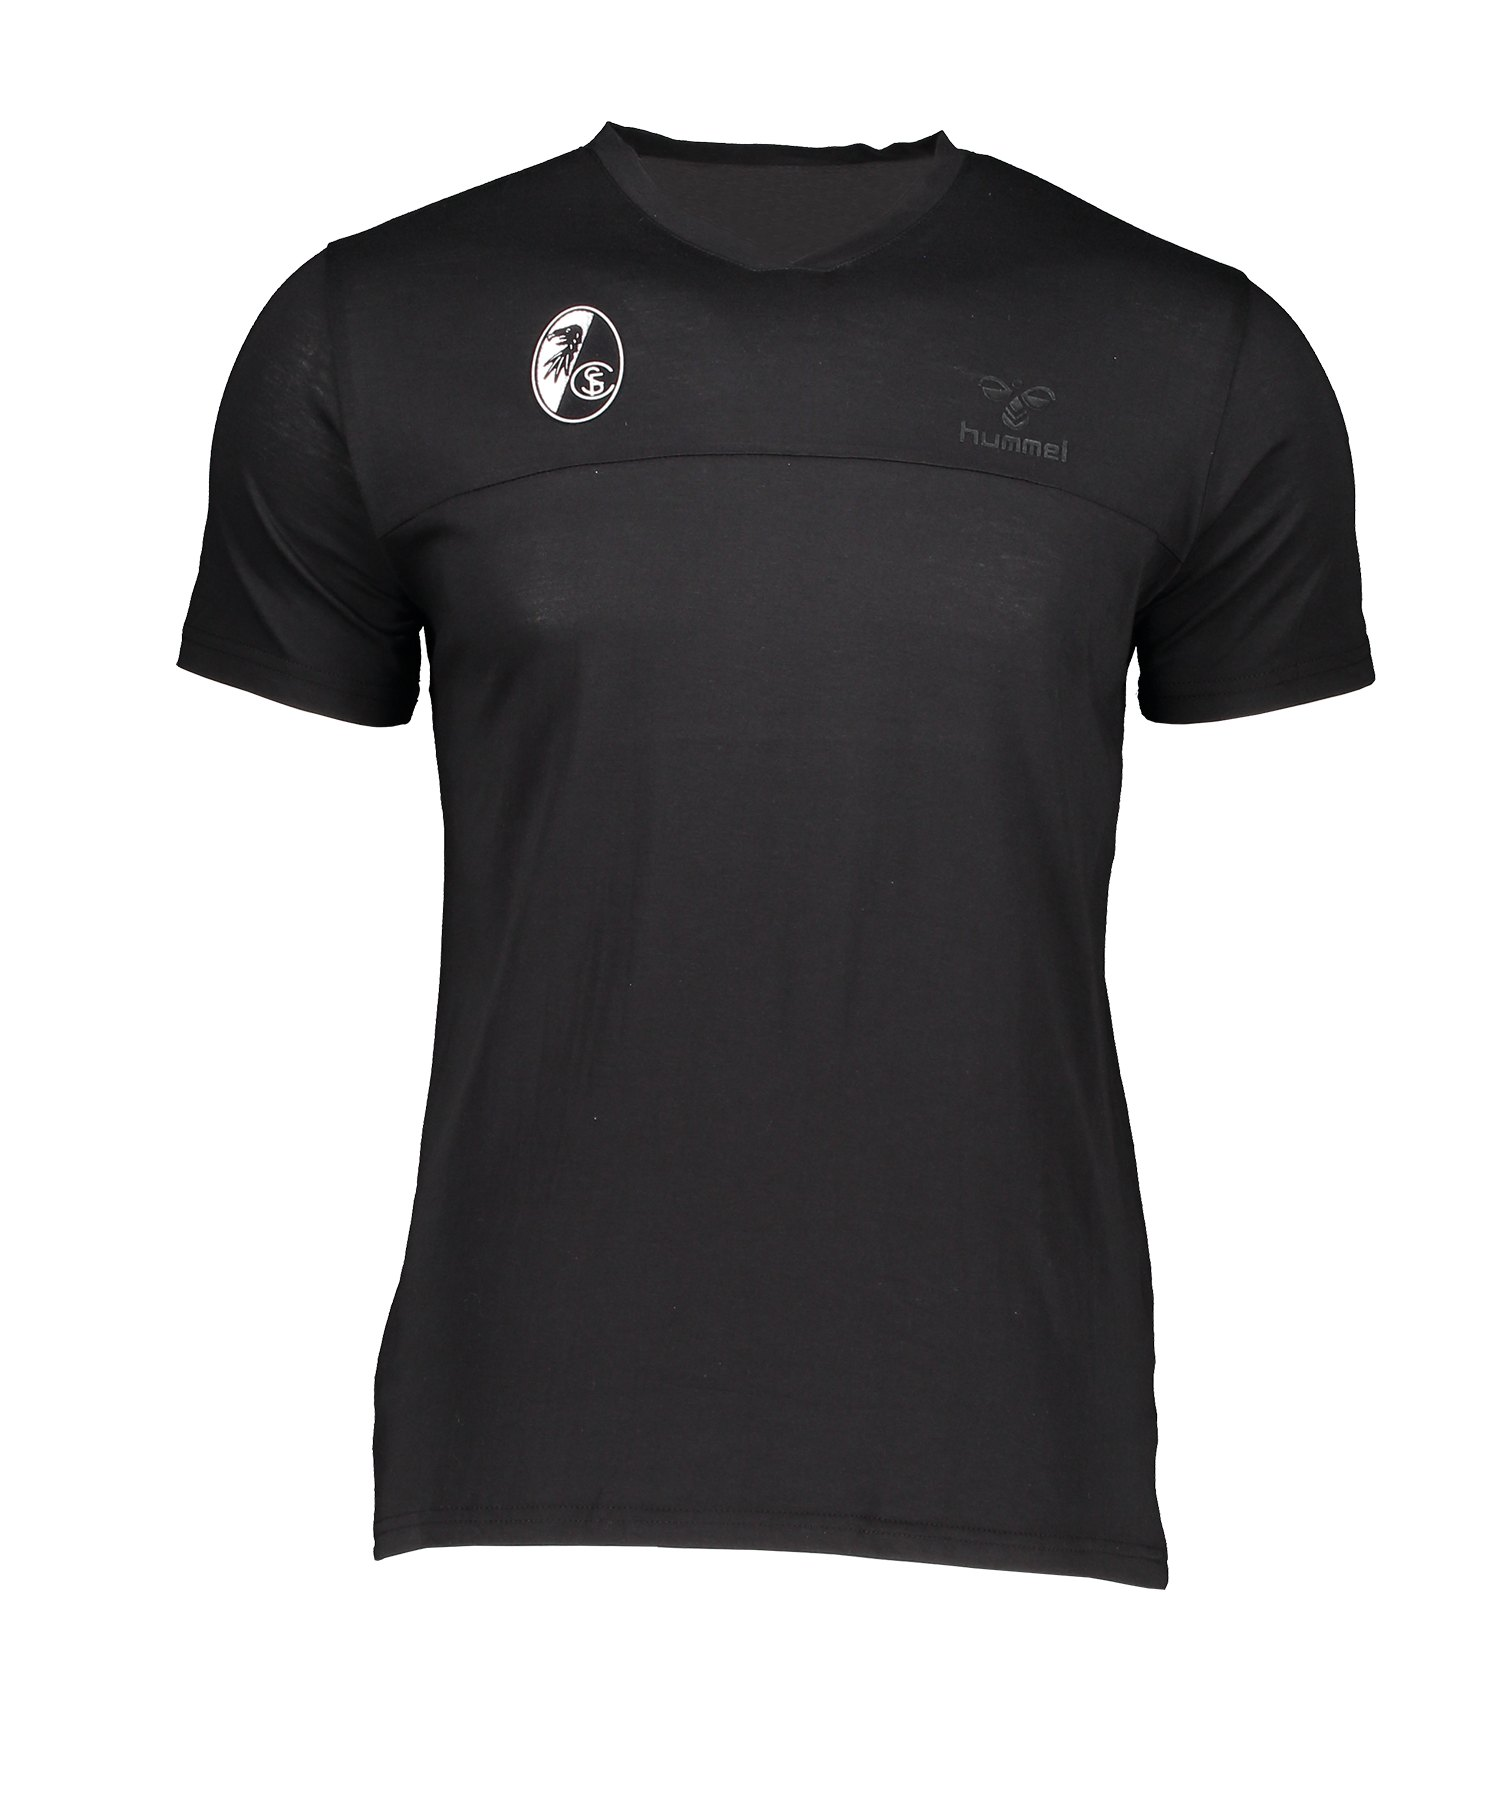 262dda6aea4cb3 Hummel SC Freiburg HMLJET T-Shirt F2001 - schwarz